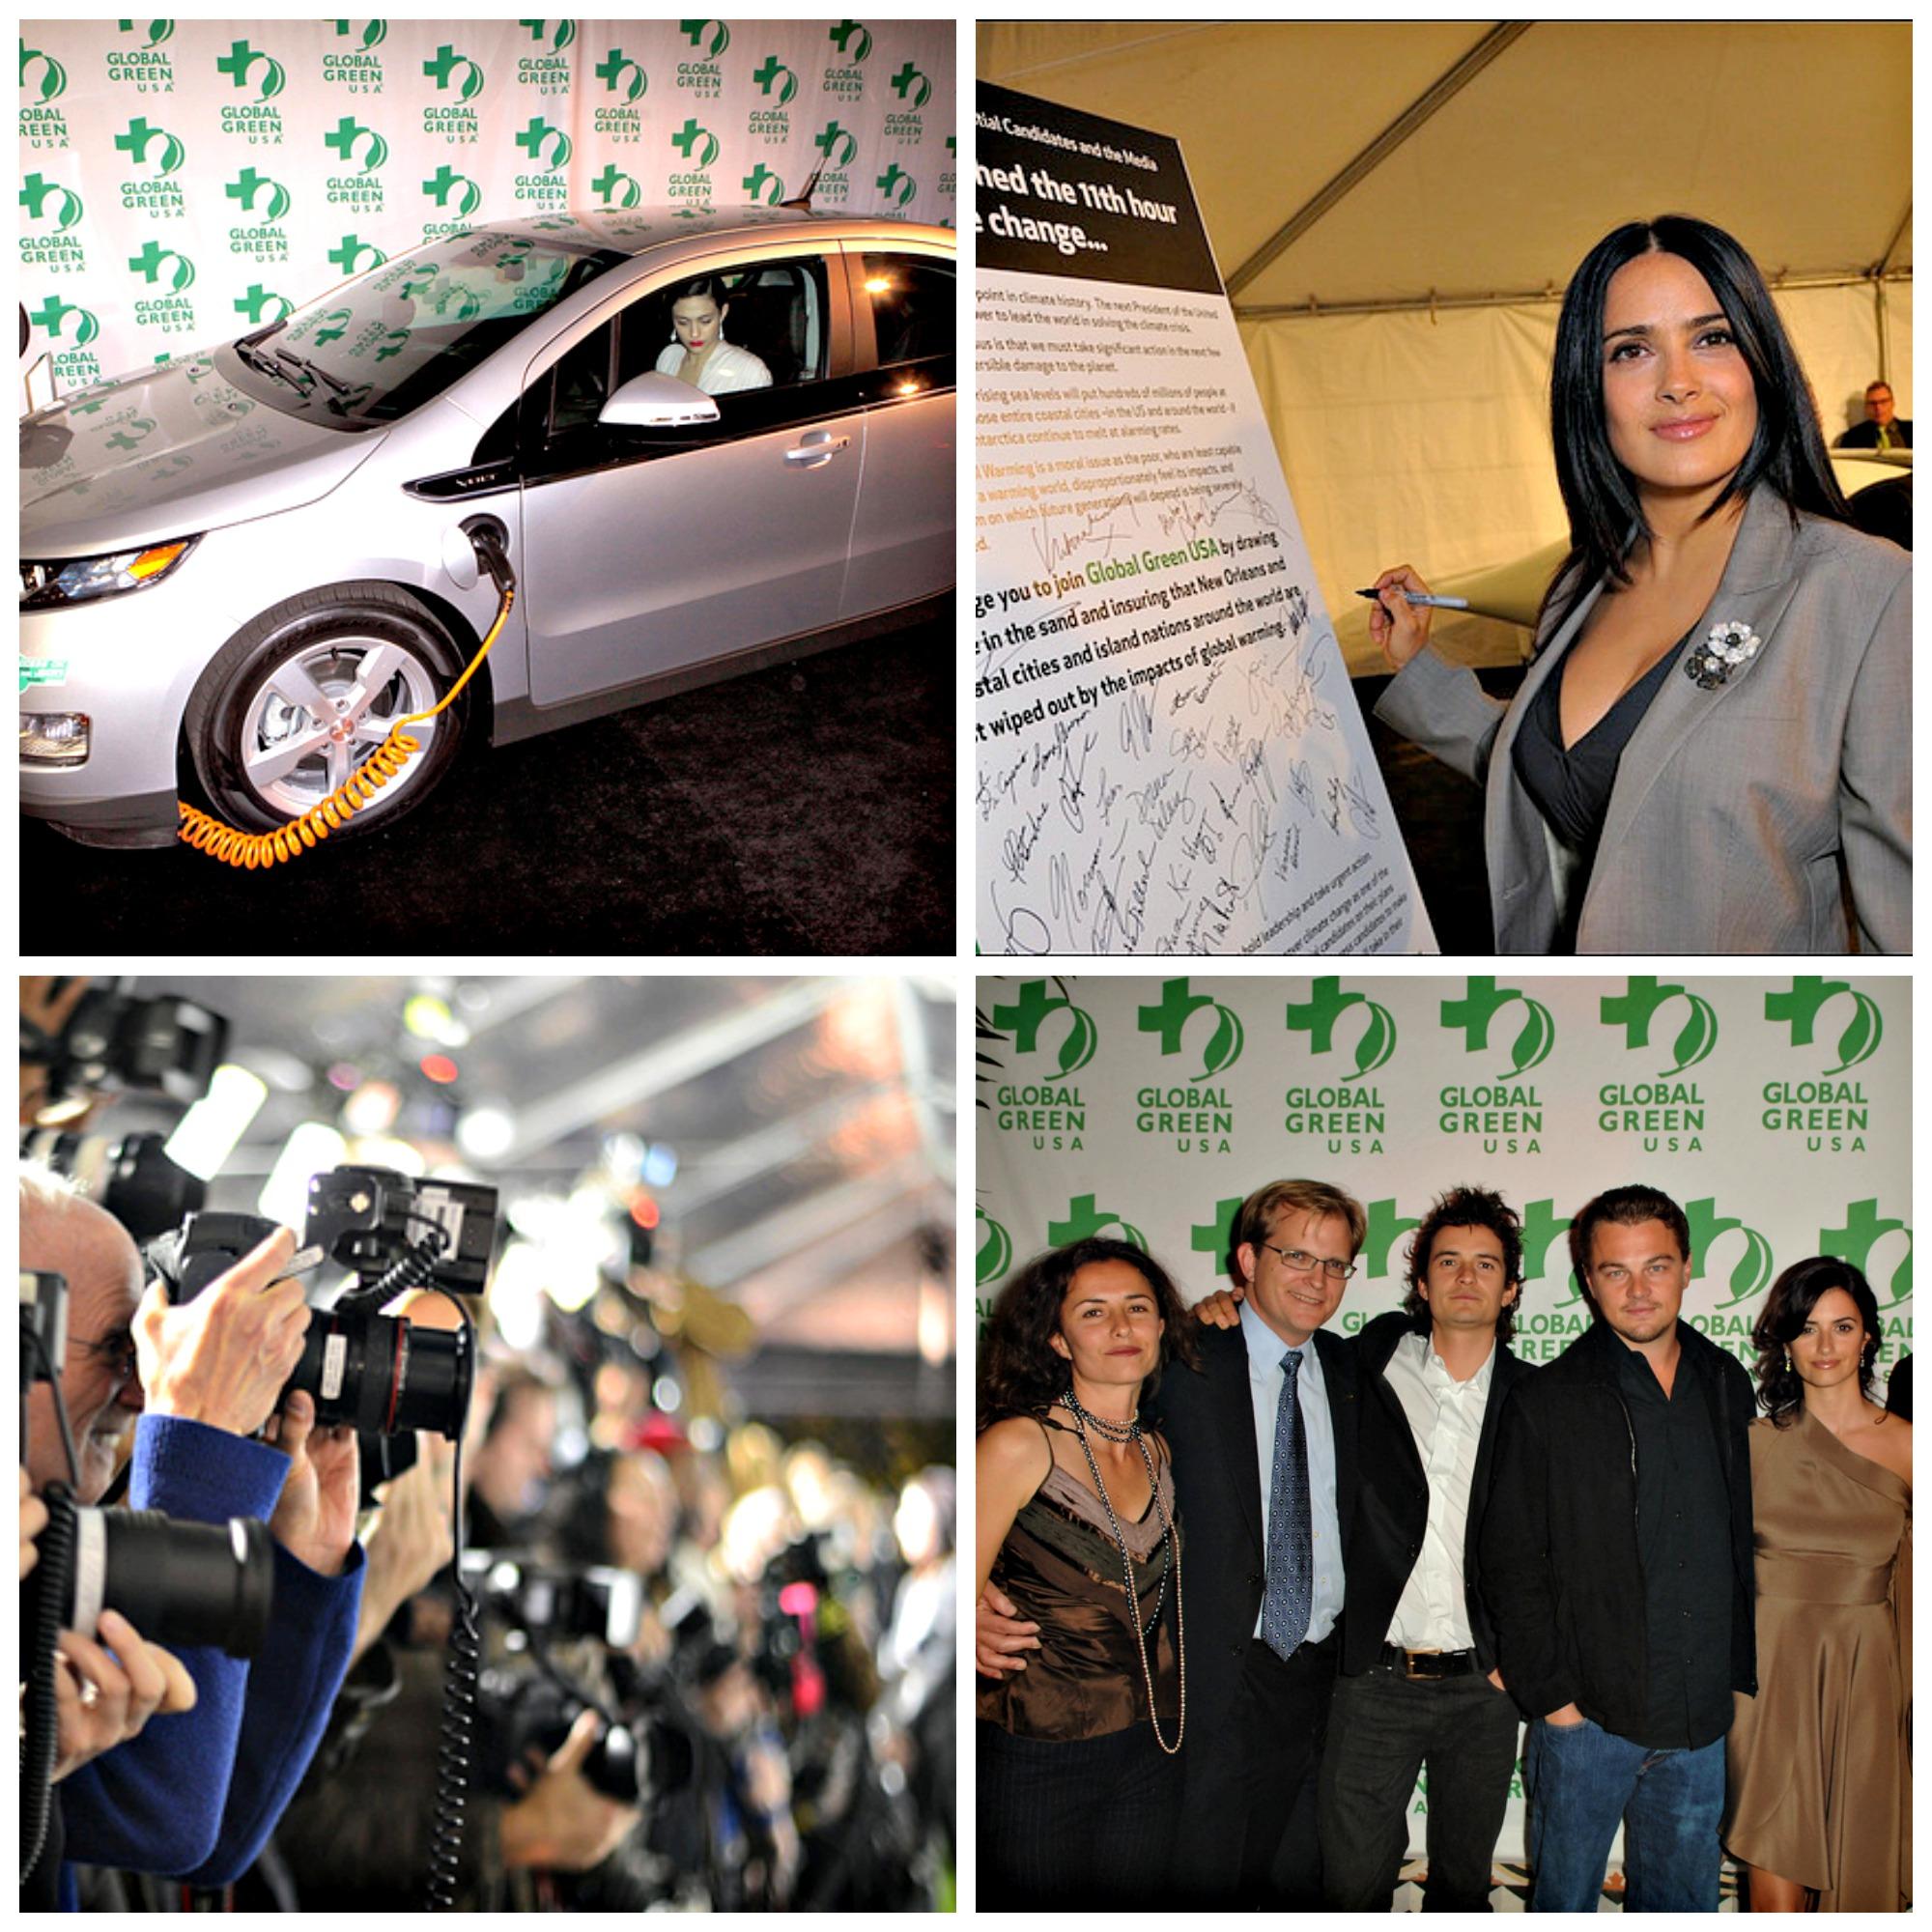 PreOscar History 4 Collage